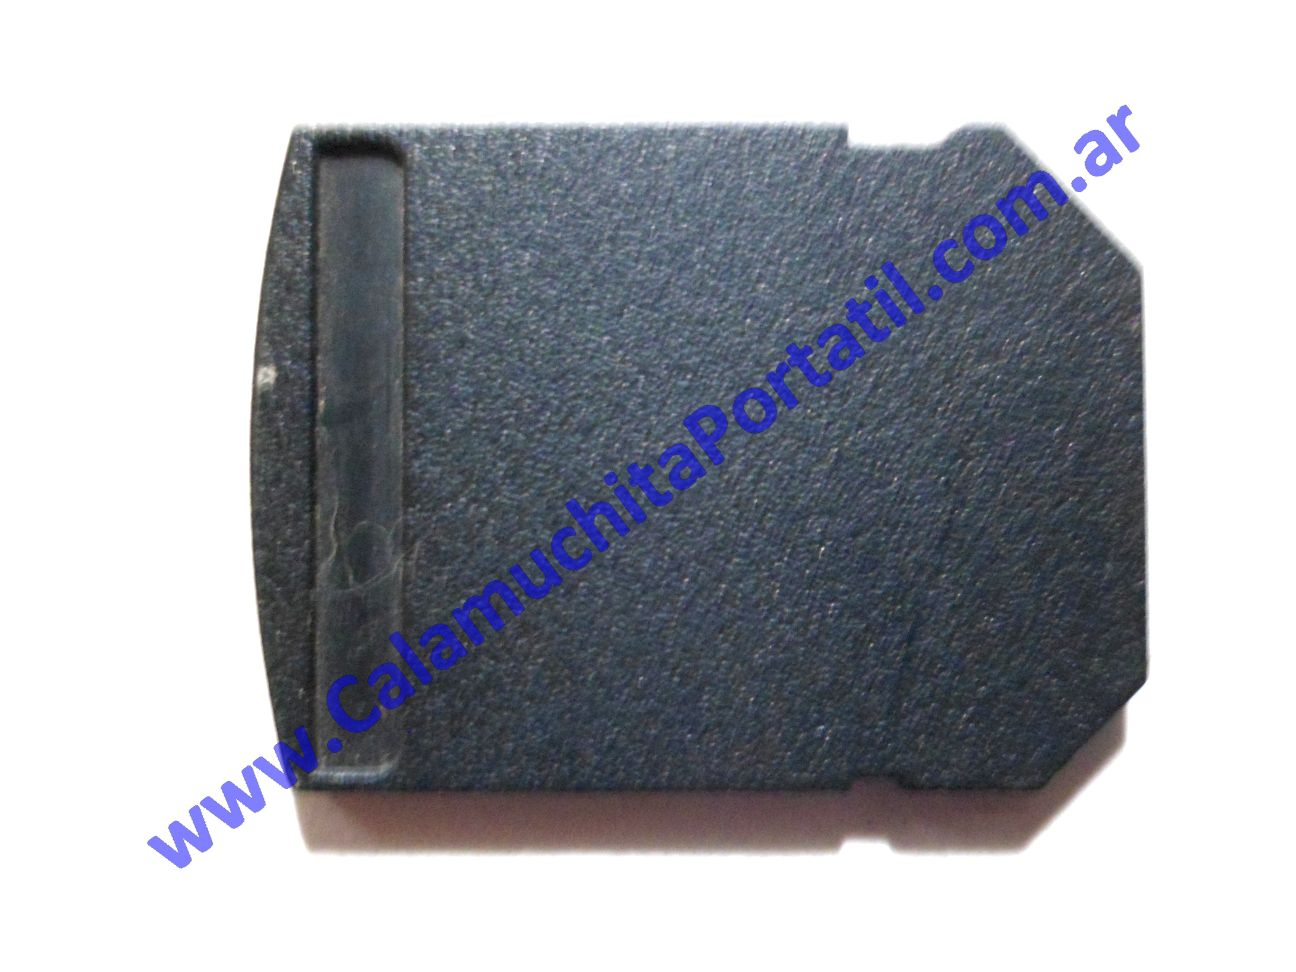 0150XPS Protector SD Asus Eee PC 1005HA